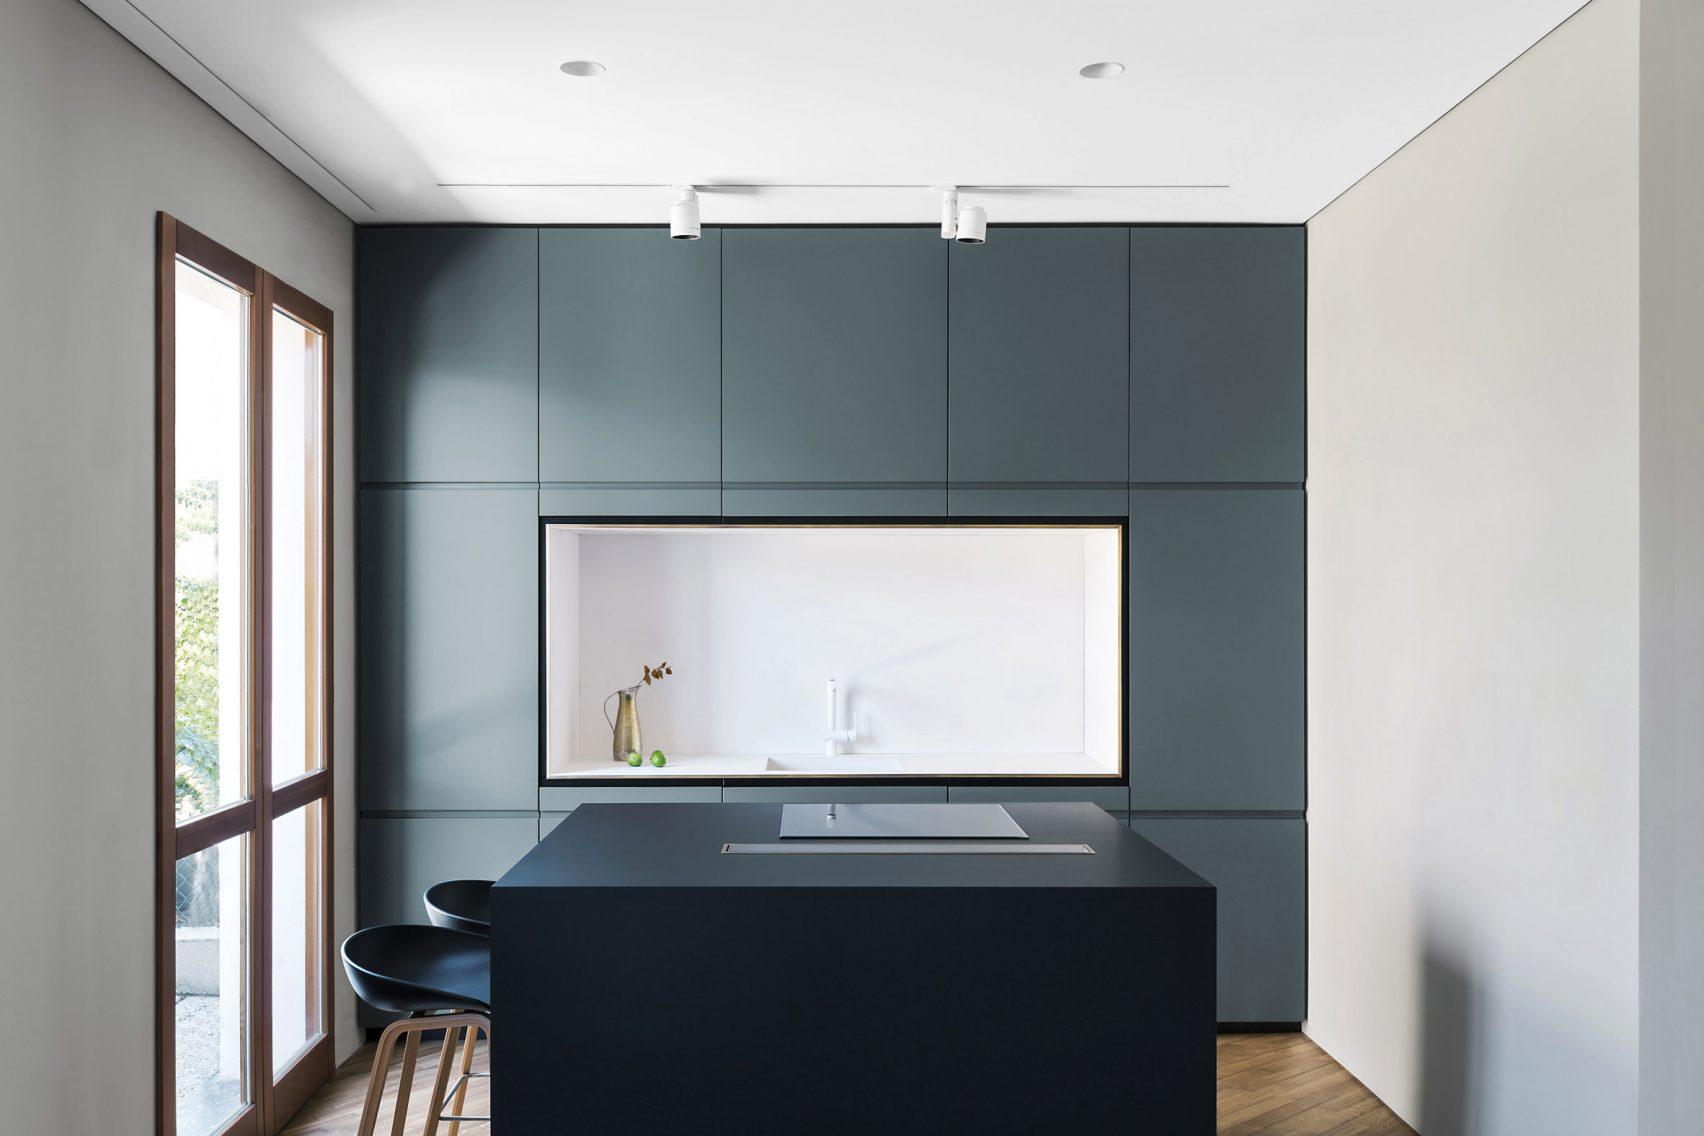 Keuken Kookeiland Zwart : Strakke moderne keuken met blauwe wandkast en zwart kookeiland